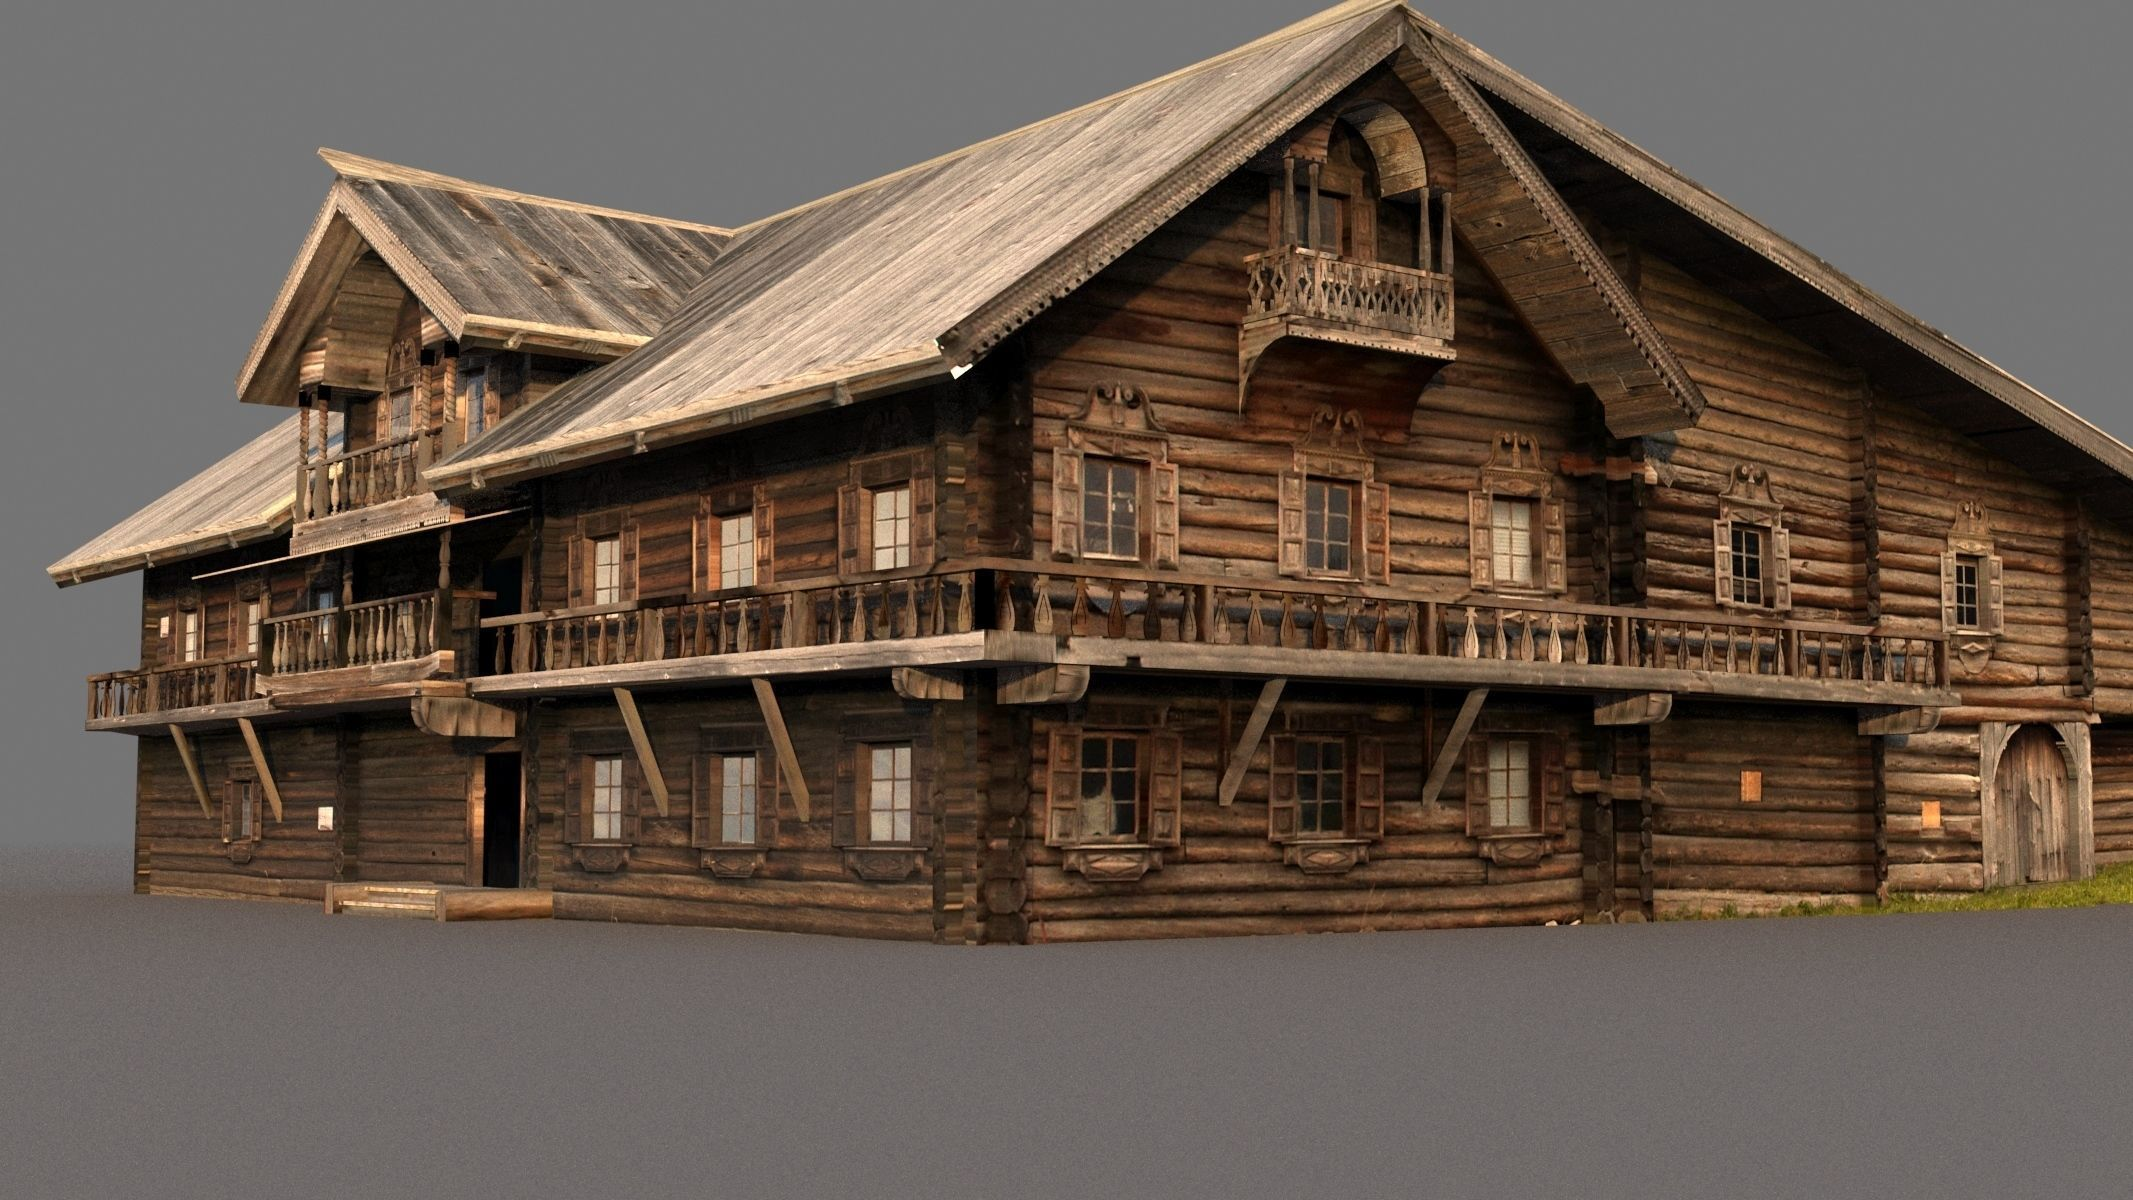 Russian wooden house on Kizhi island